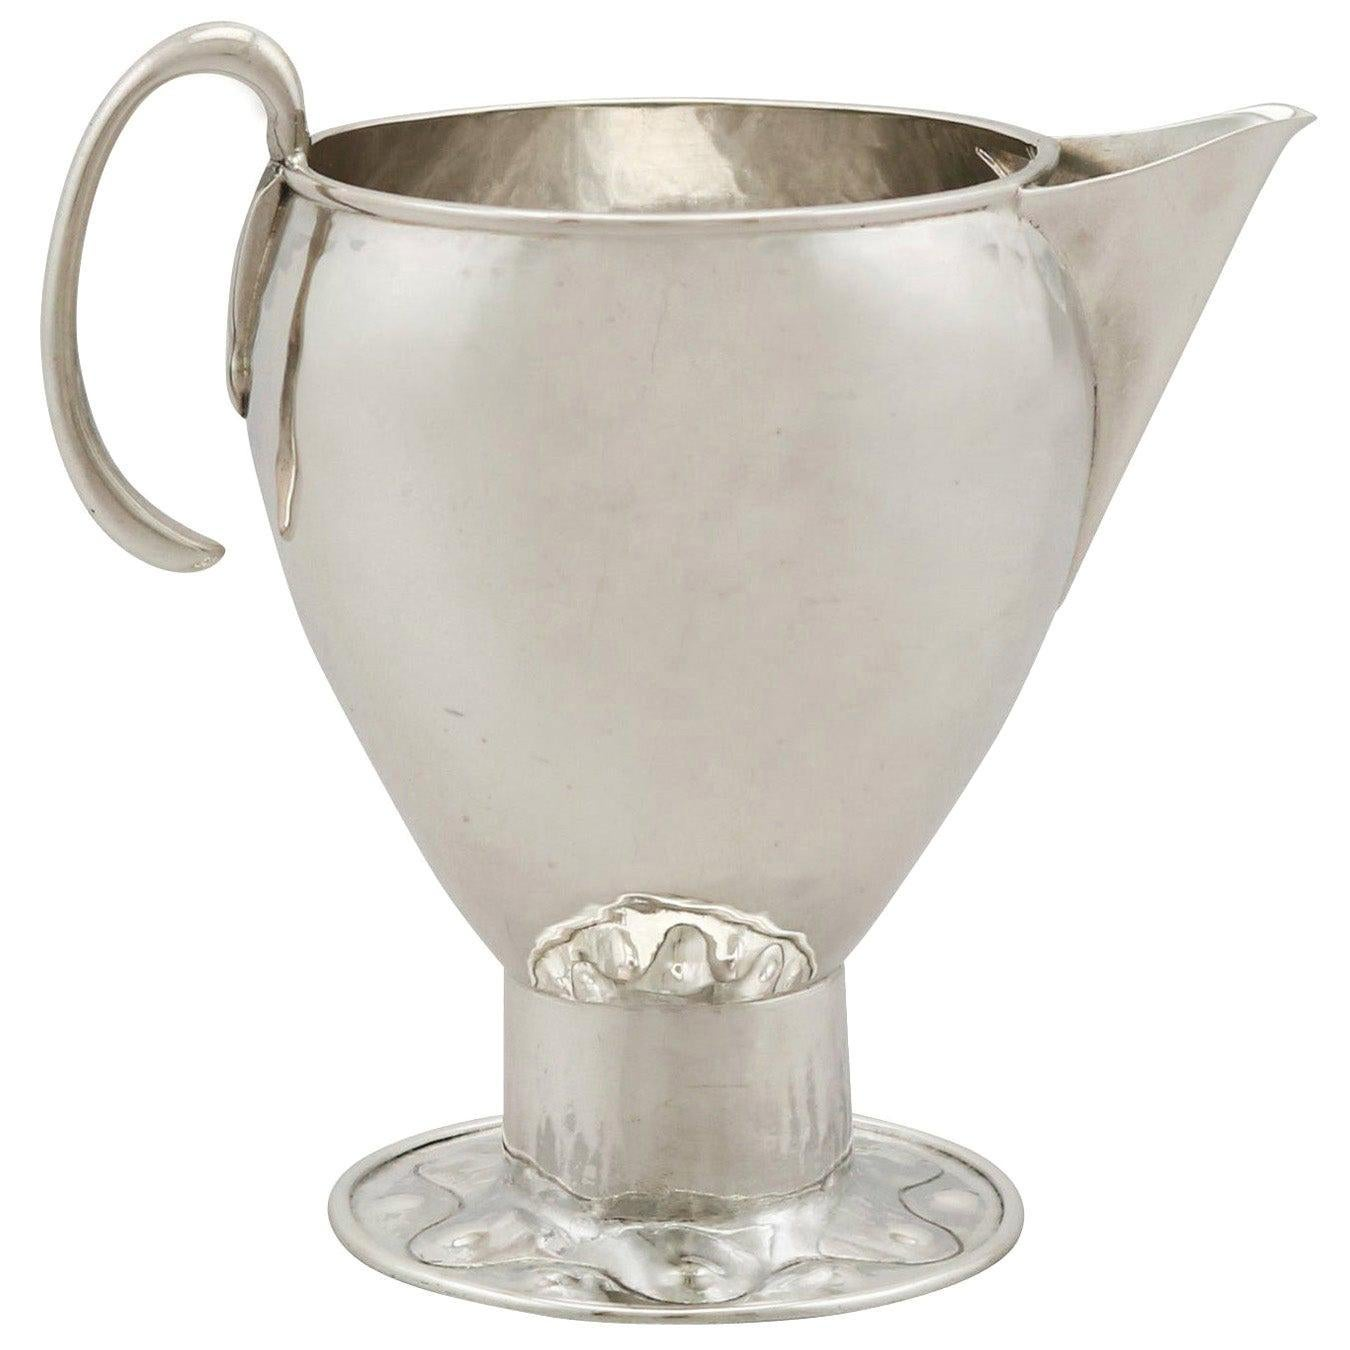 Antique George V Sterling Silver Cream Jug by A E Jones